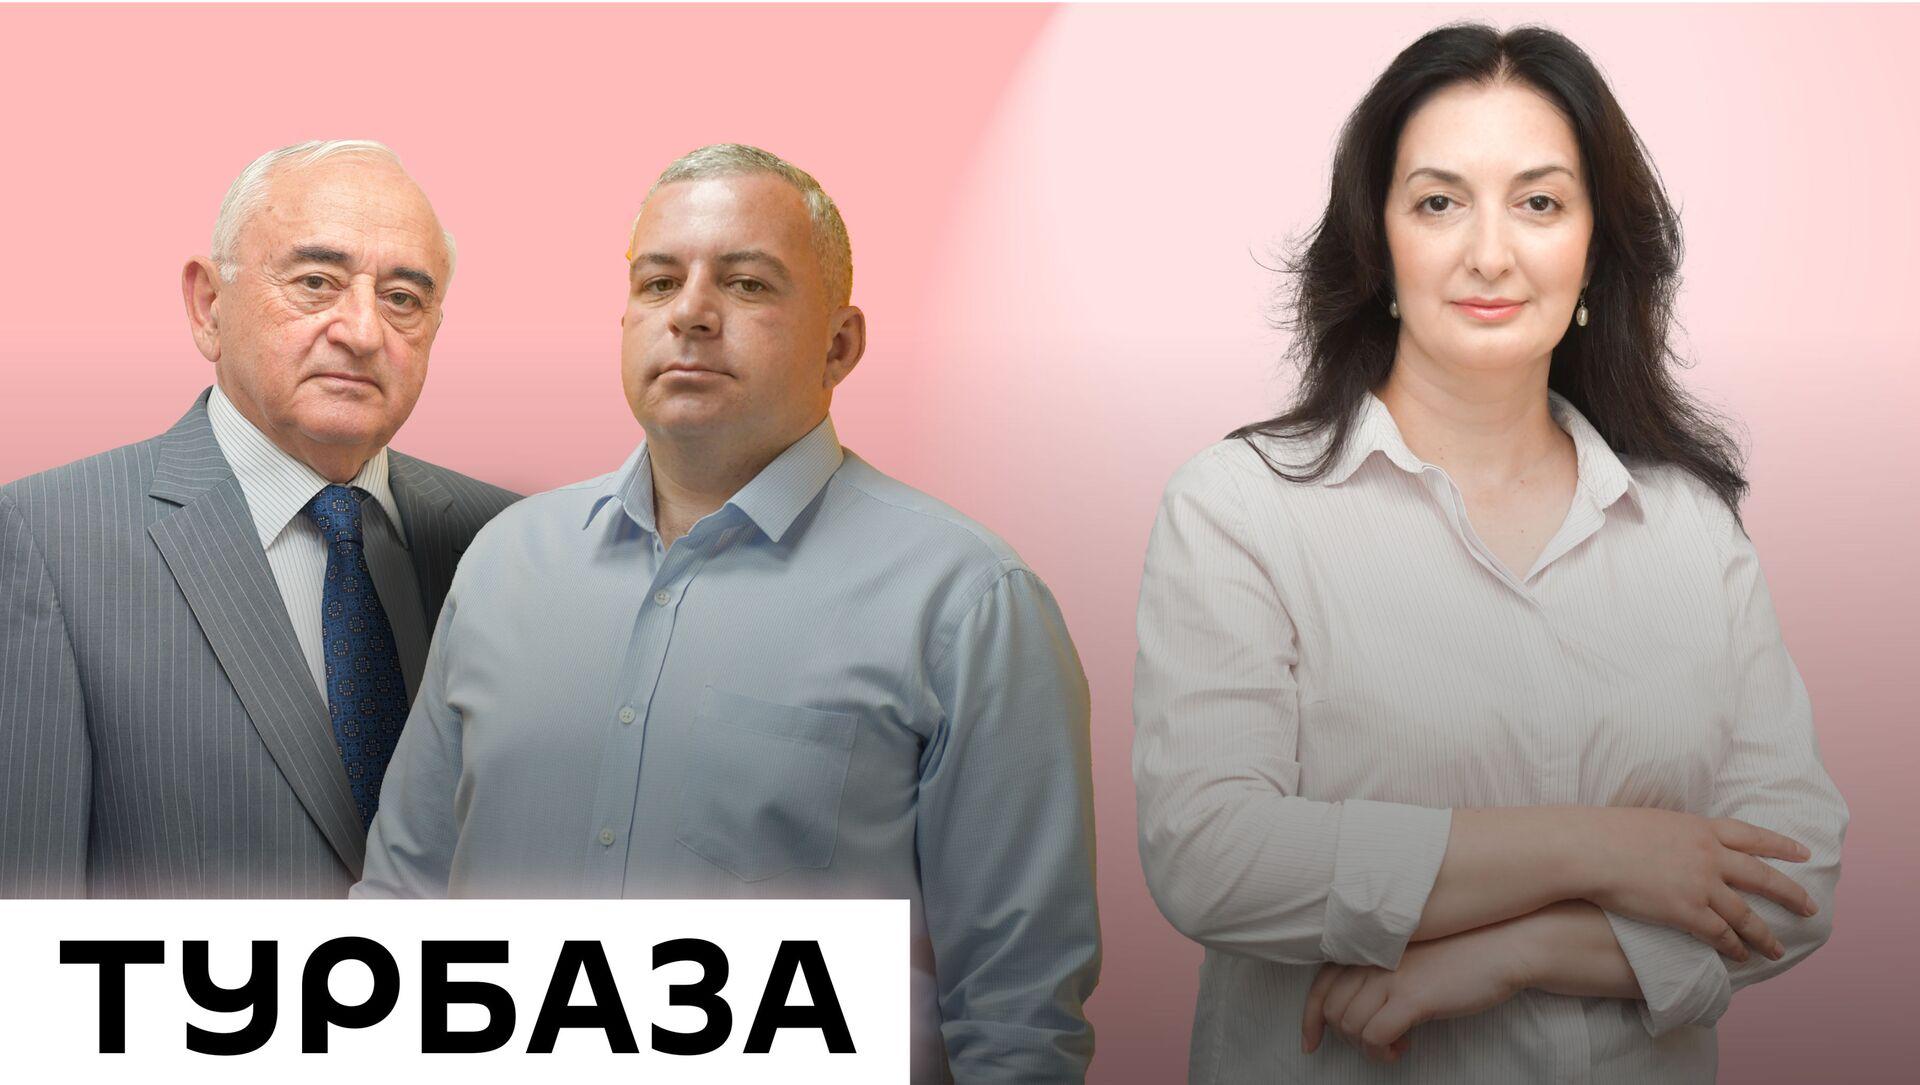 Астамур Барциц и Валерий Аршба - Sputnik Абхазия, 1920, 16.09.2021